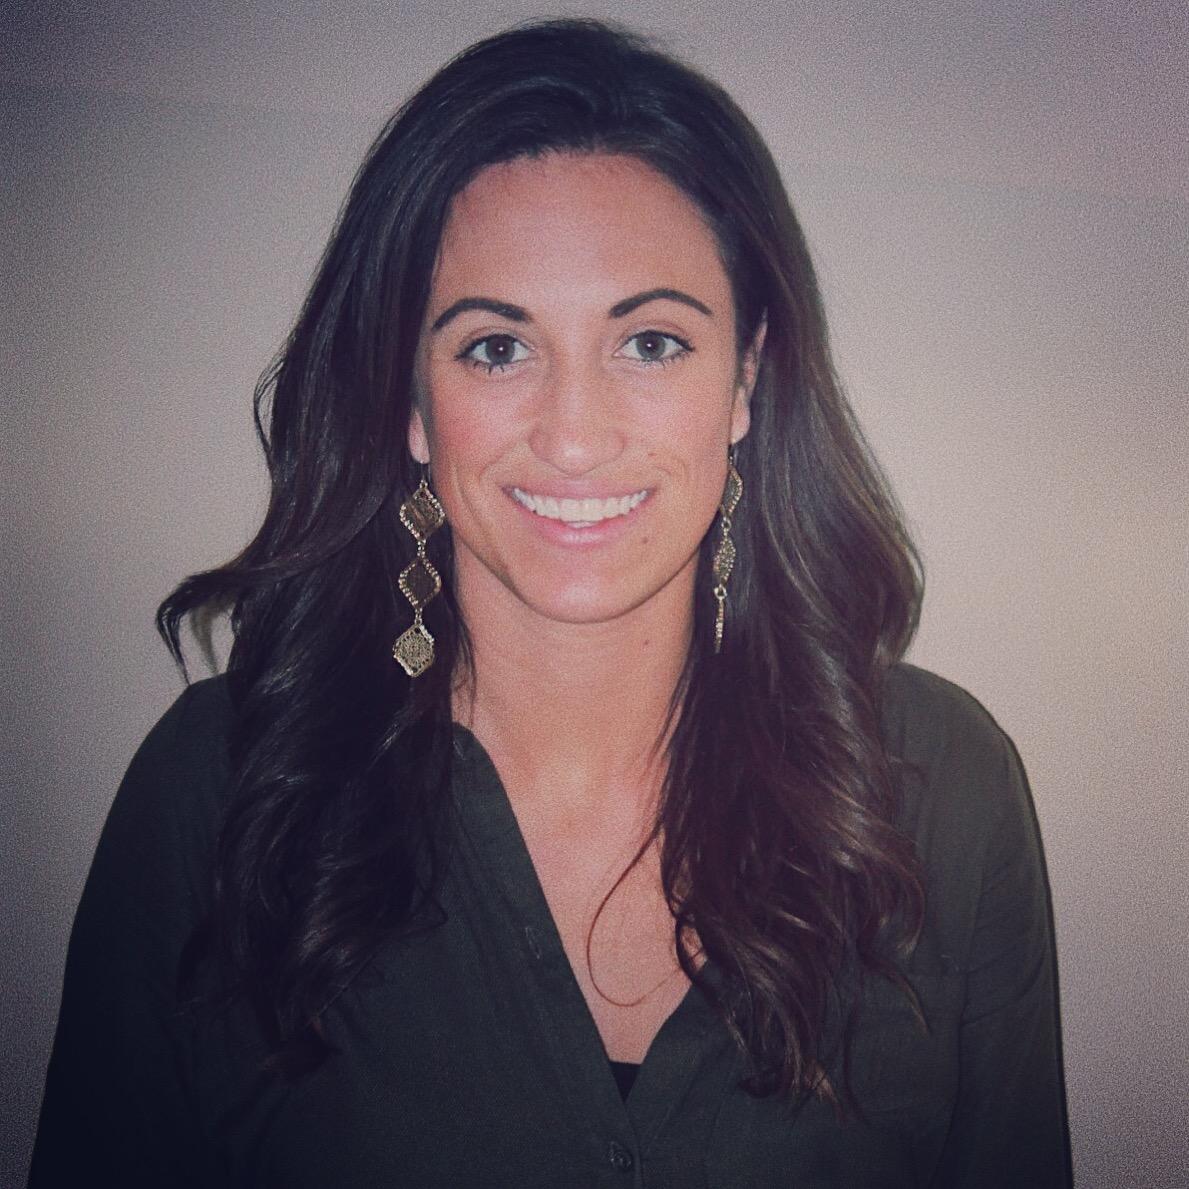 Danielle Vinci